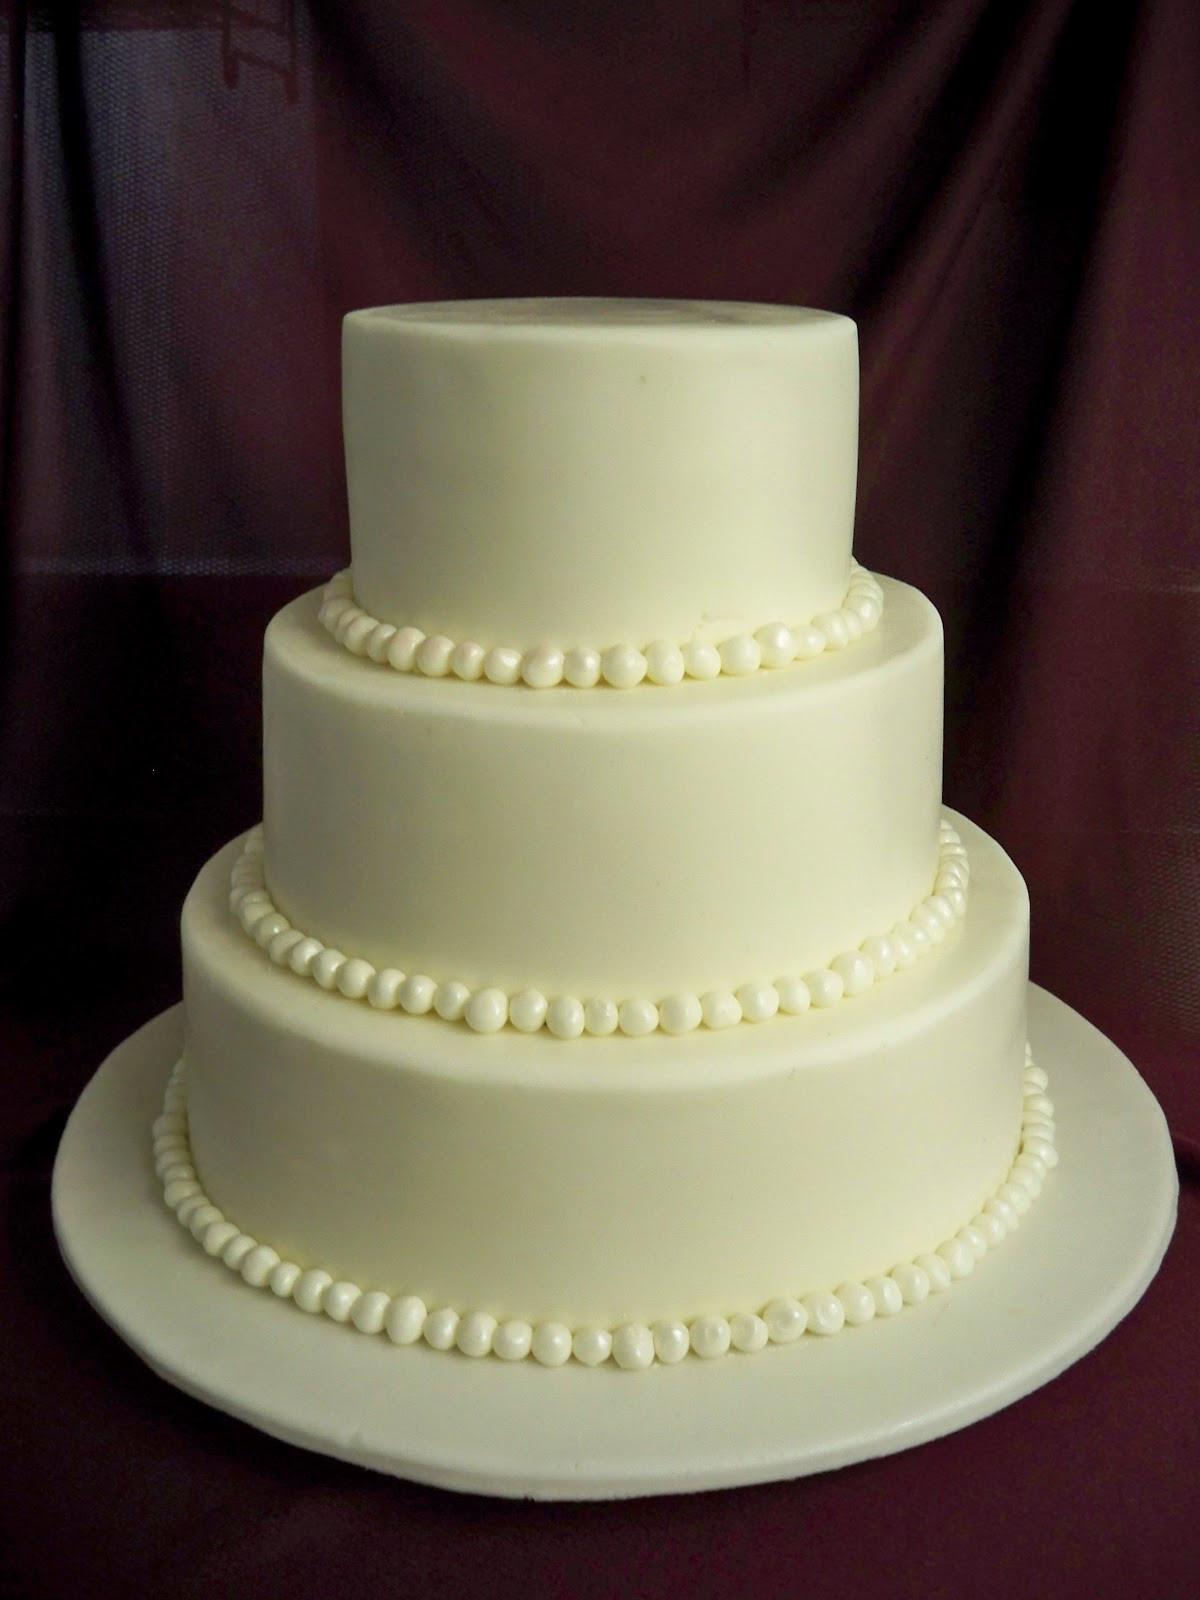 Walmart 3 Tier Wedding Cakes  3 tier wedding cake price idea in 2017